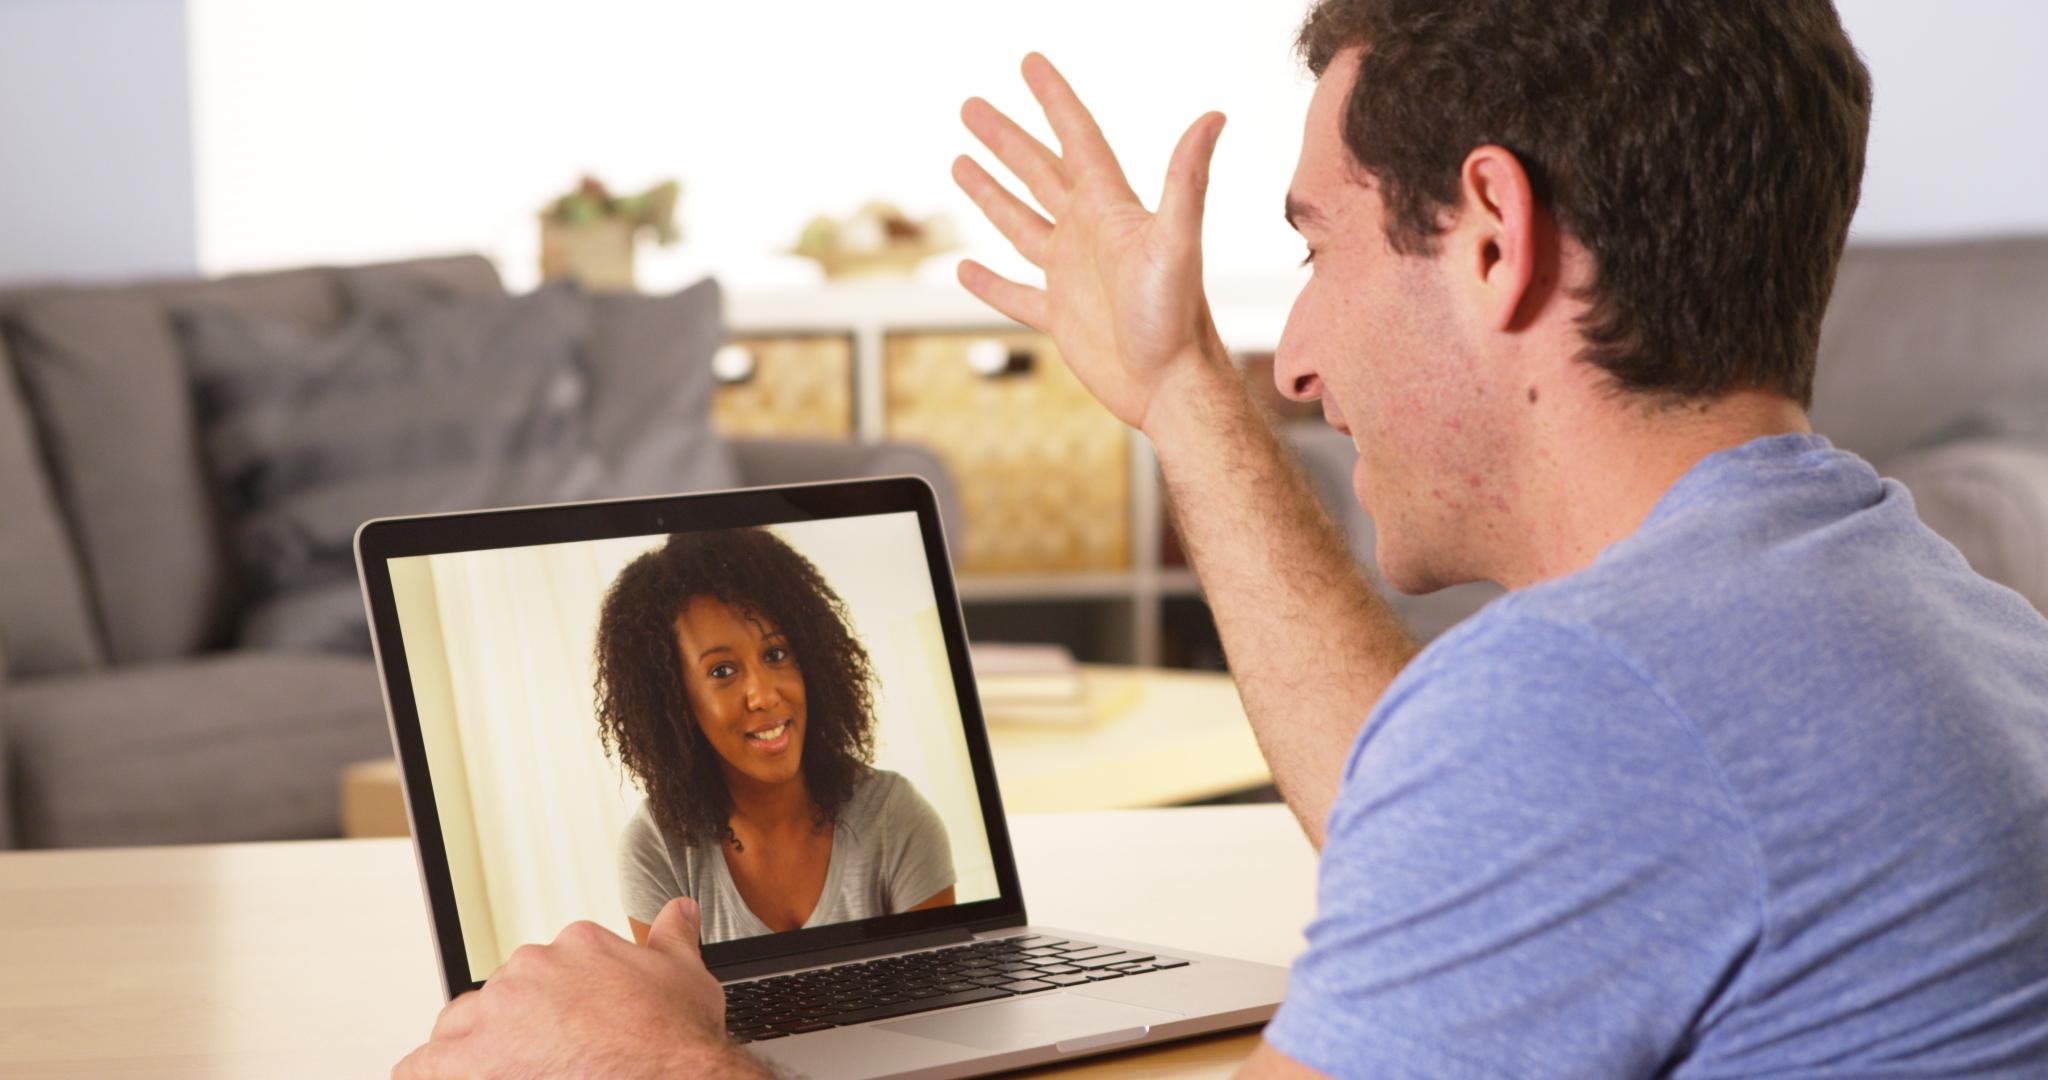 Laptop Video Call